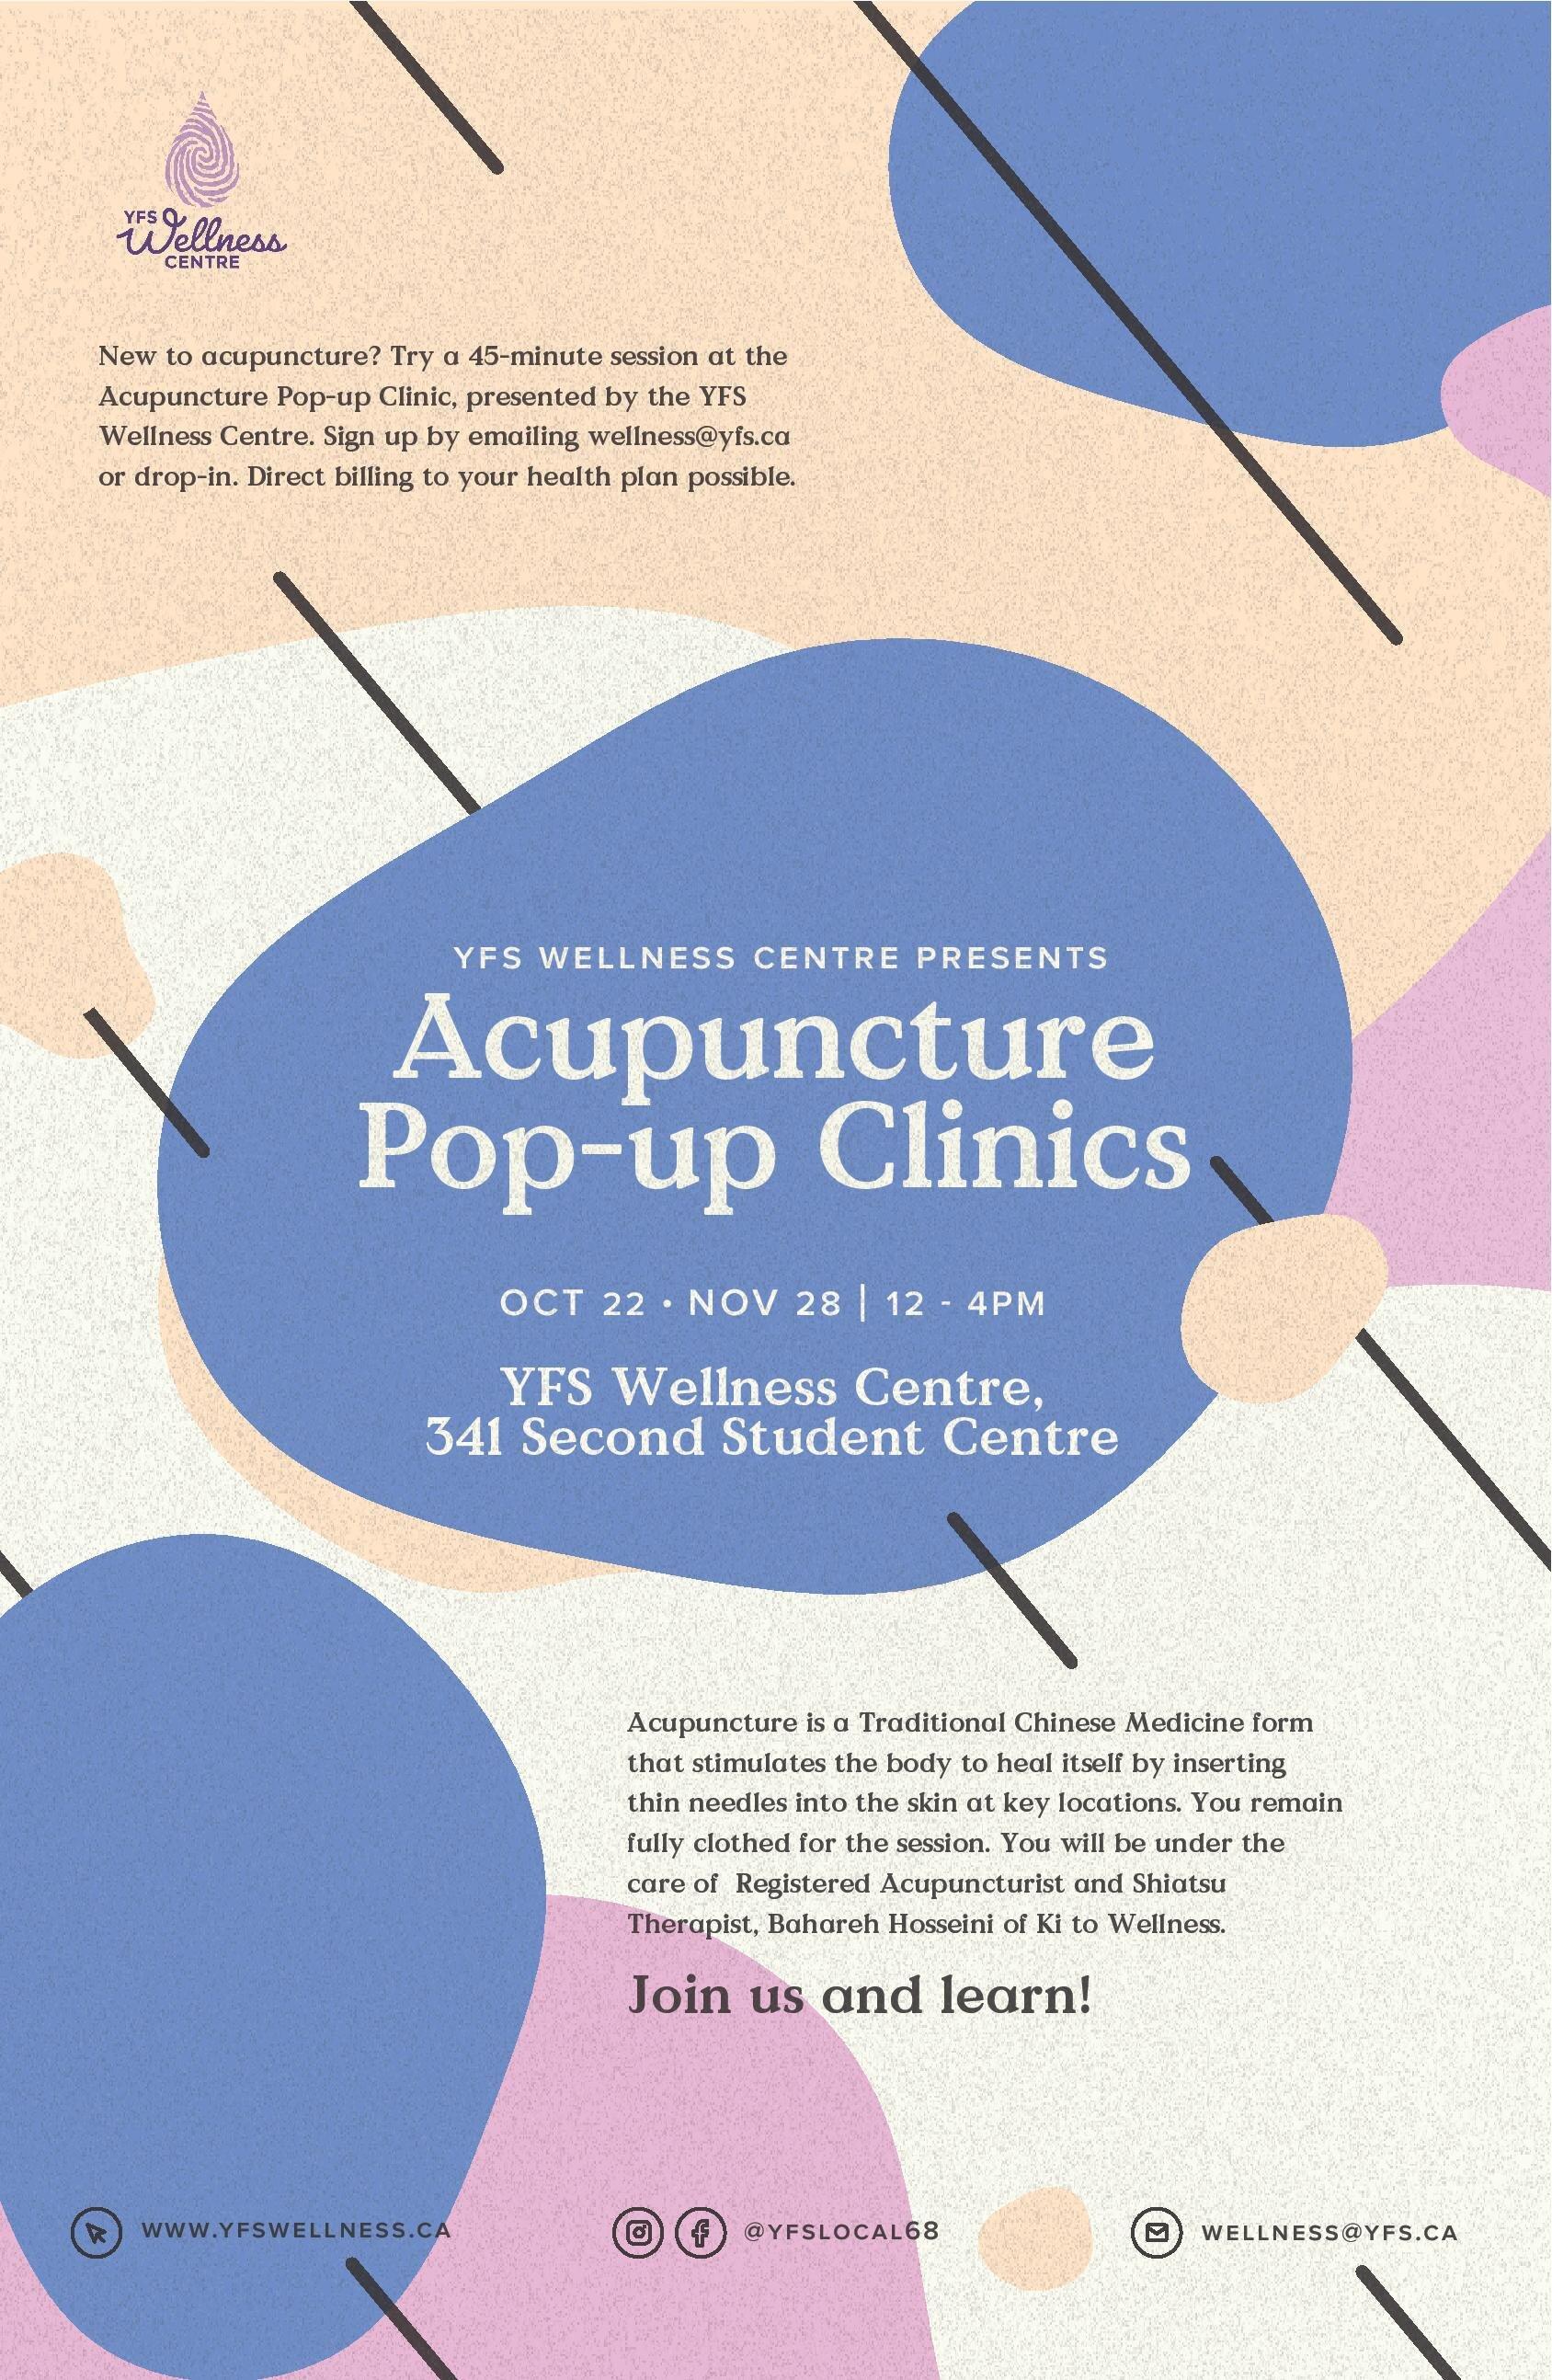 YFS_WellnessCentre_AccupuncturePop-UpClinics_Poster_printfile (1)-page-001.jpg